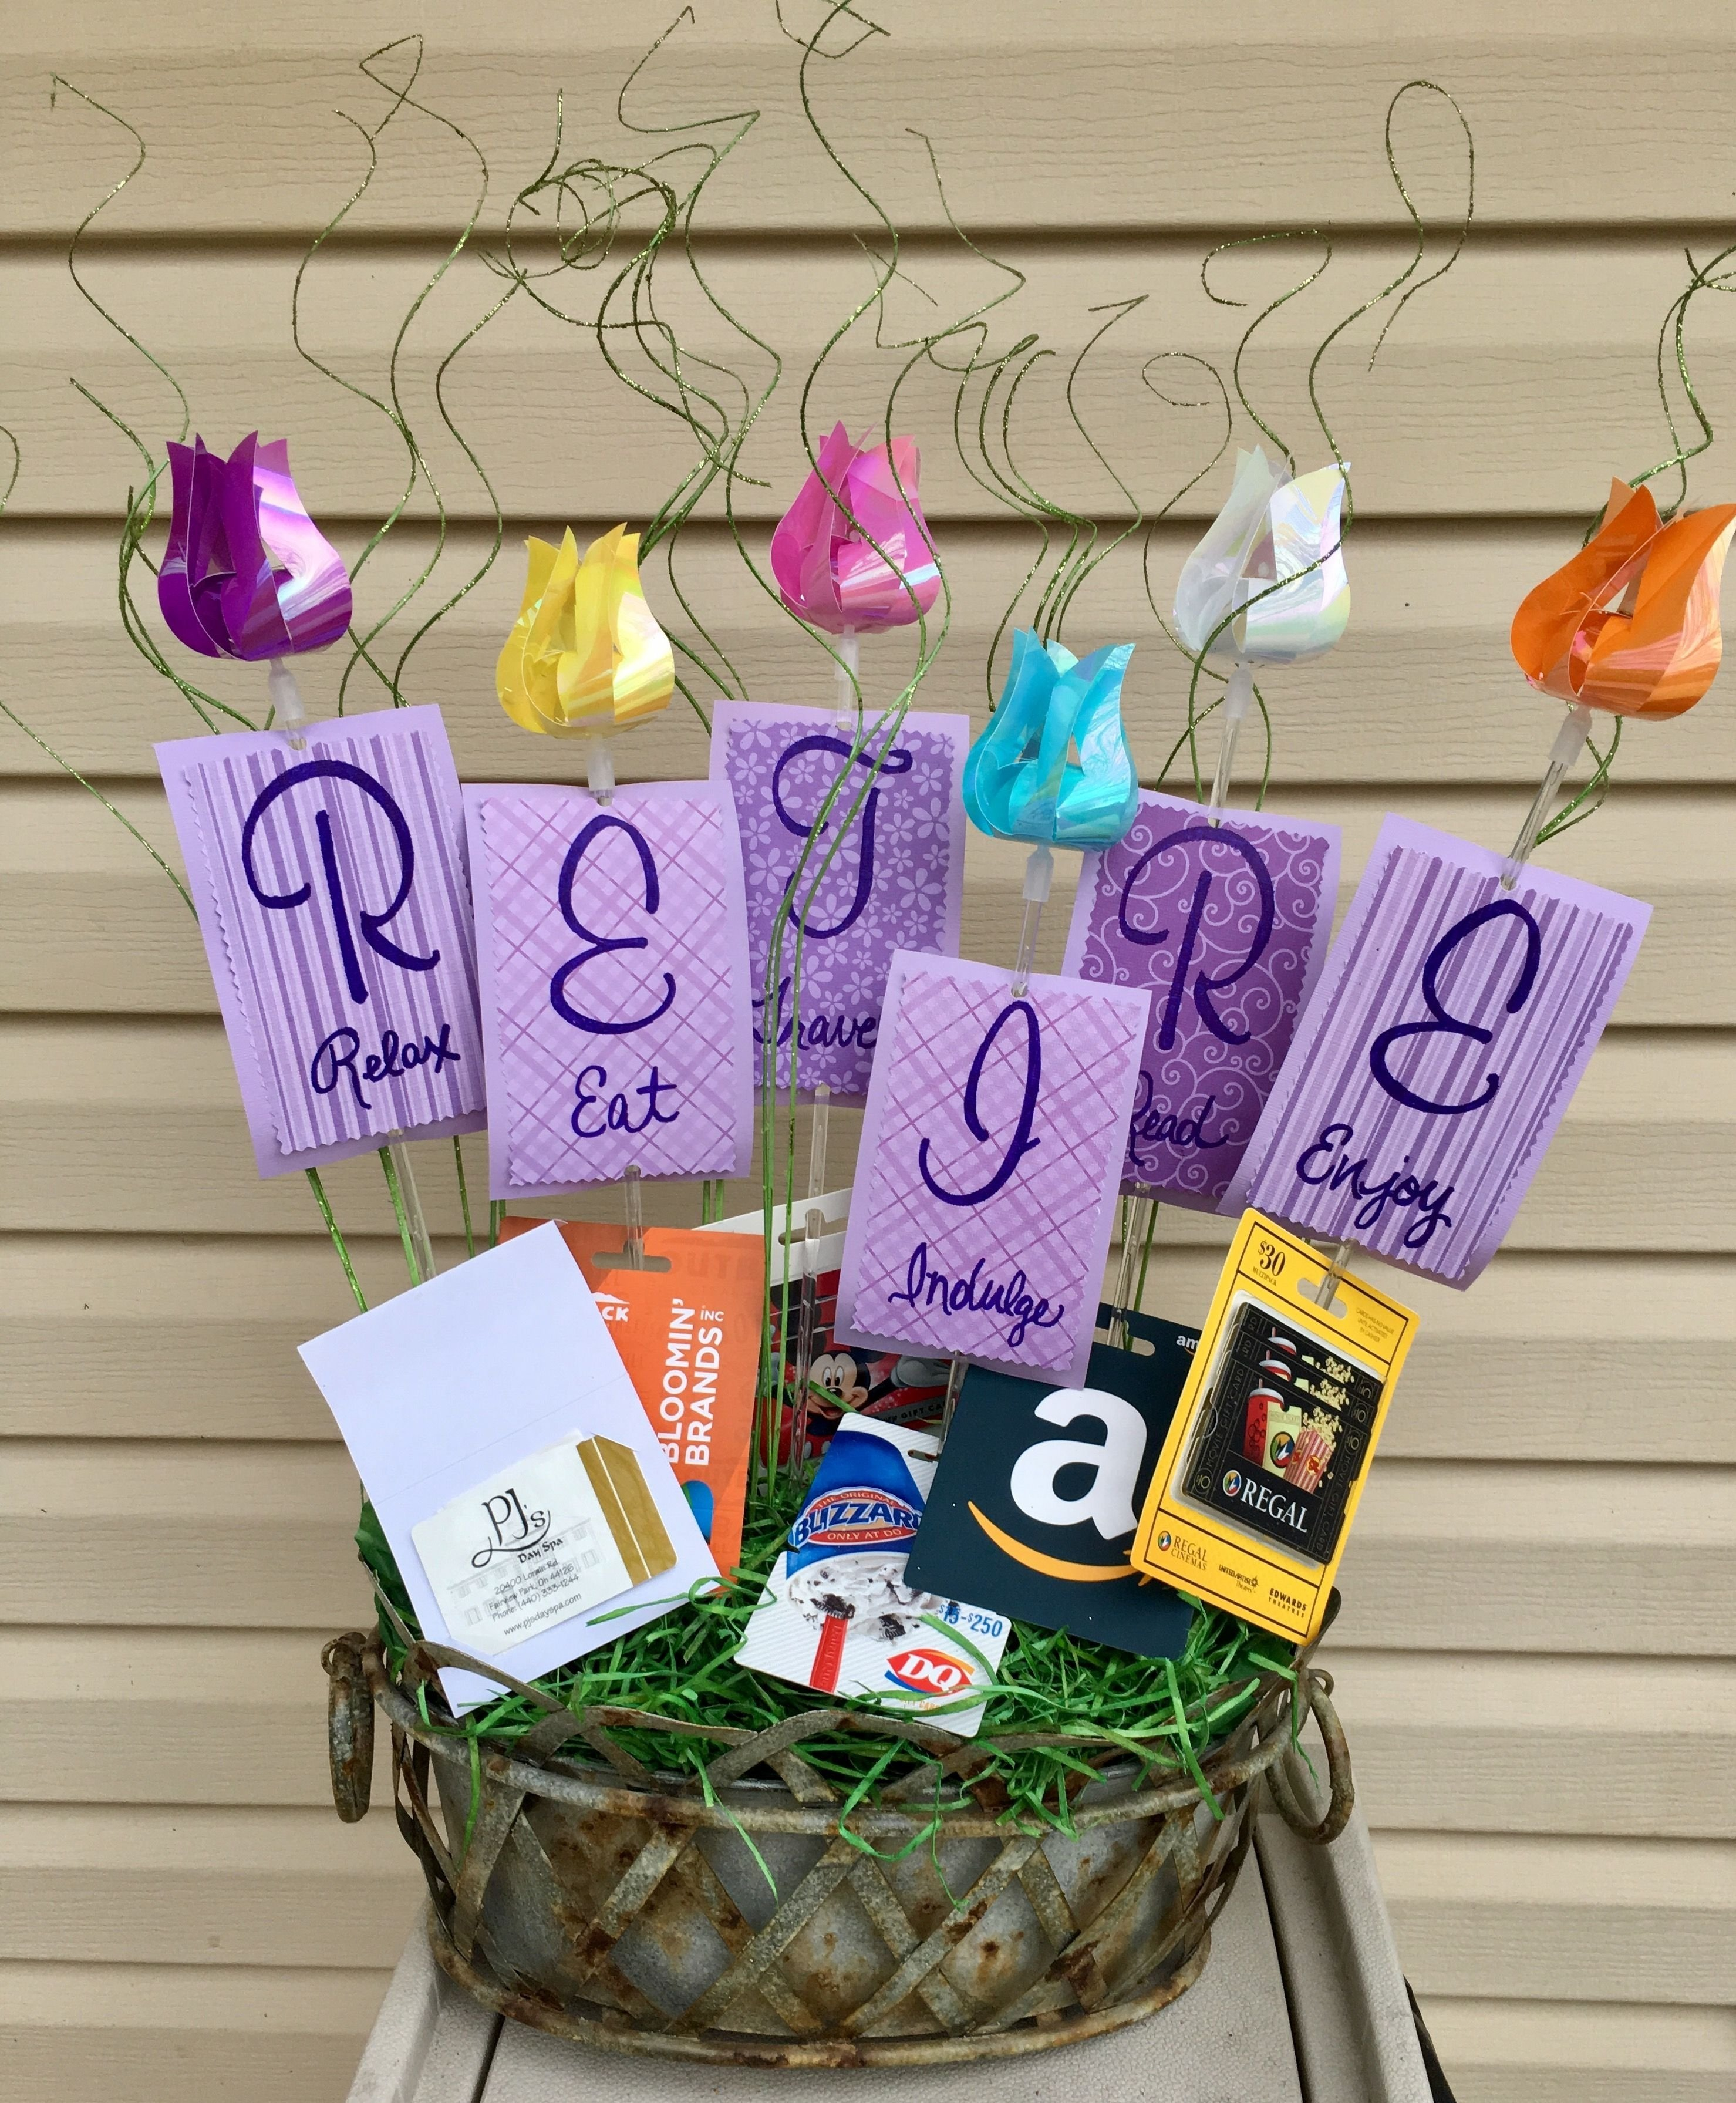 10 Elegant Retirement Gift Ideas For Women retirement gift basket with gift cards relax eat travel indulge 2020